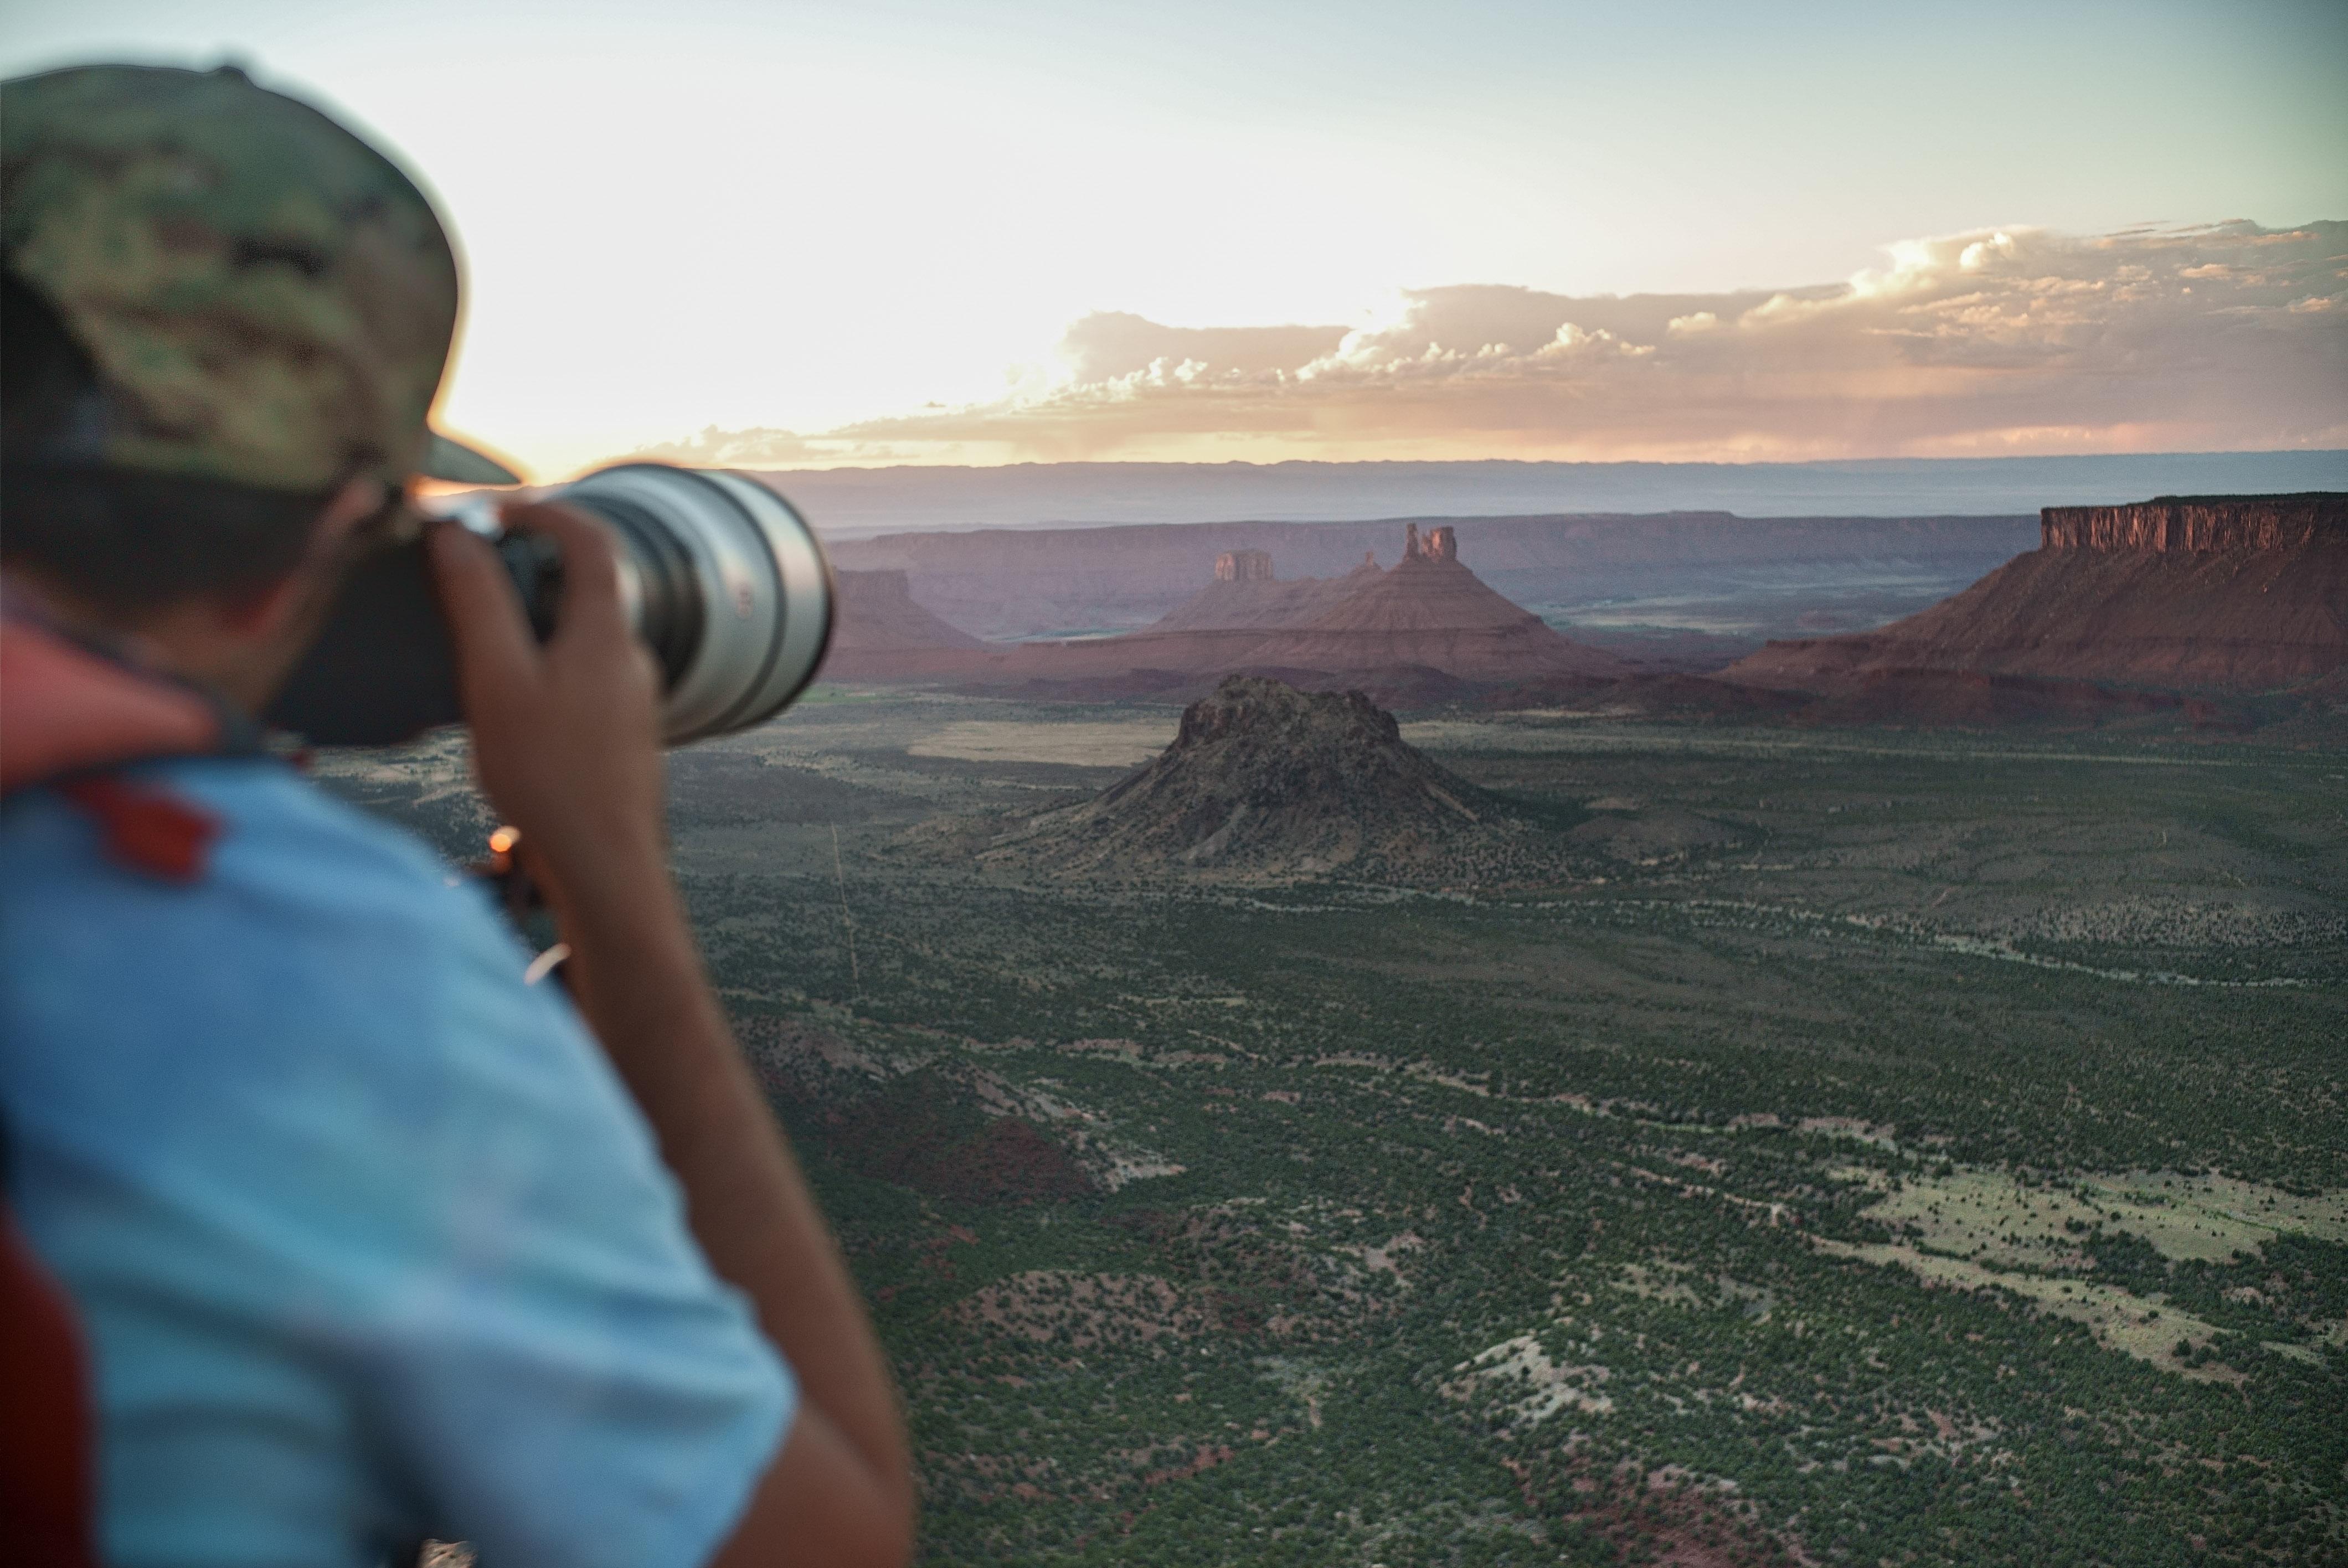 Taylor Freesolo Rees Photographer, Filmmaker, Activist. Moonwalk Andy Lewis, Sony Artisans.